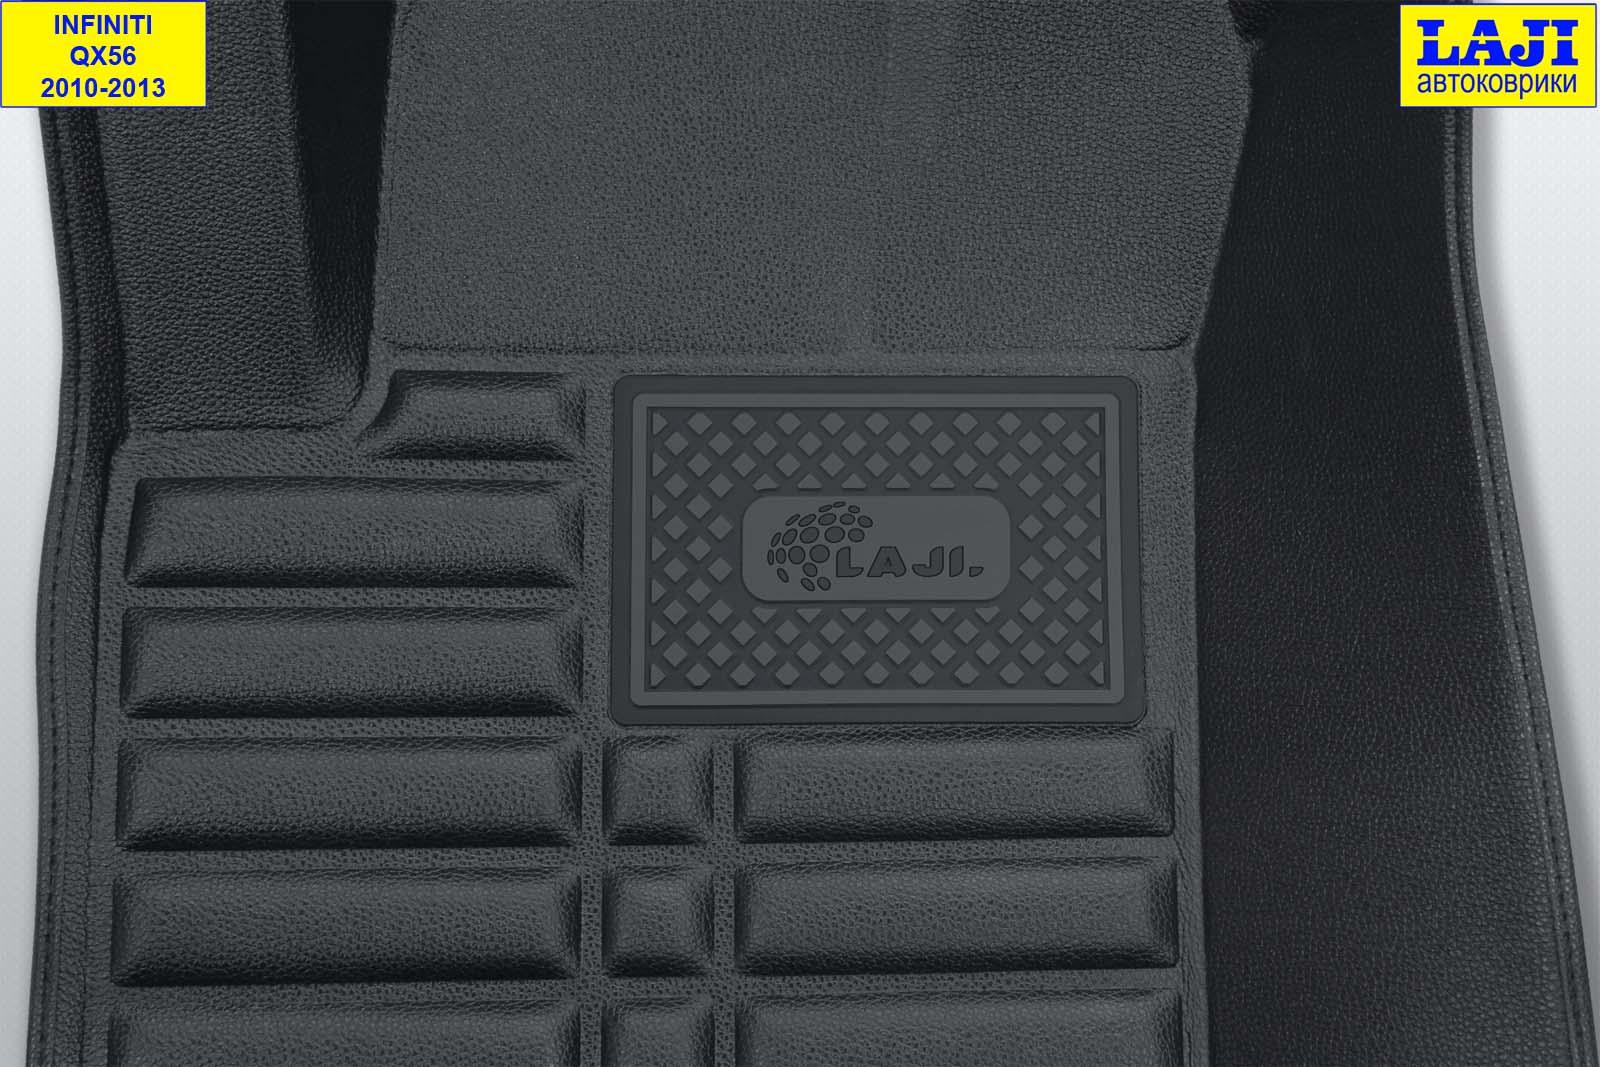 5D коврики в салон Infiniti QX56 2010-2013 7